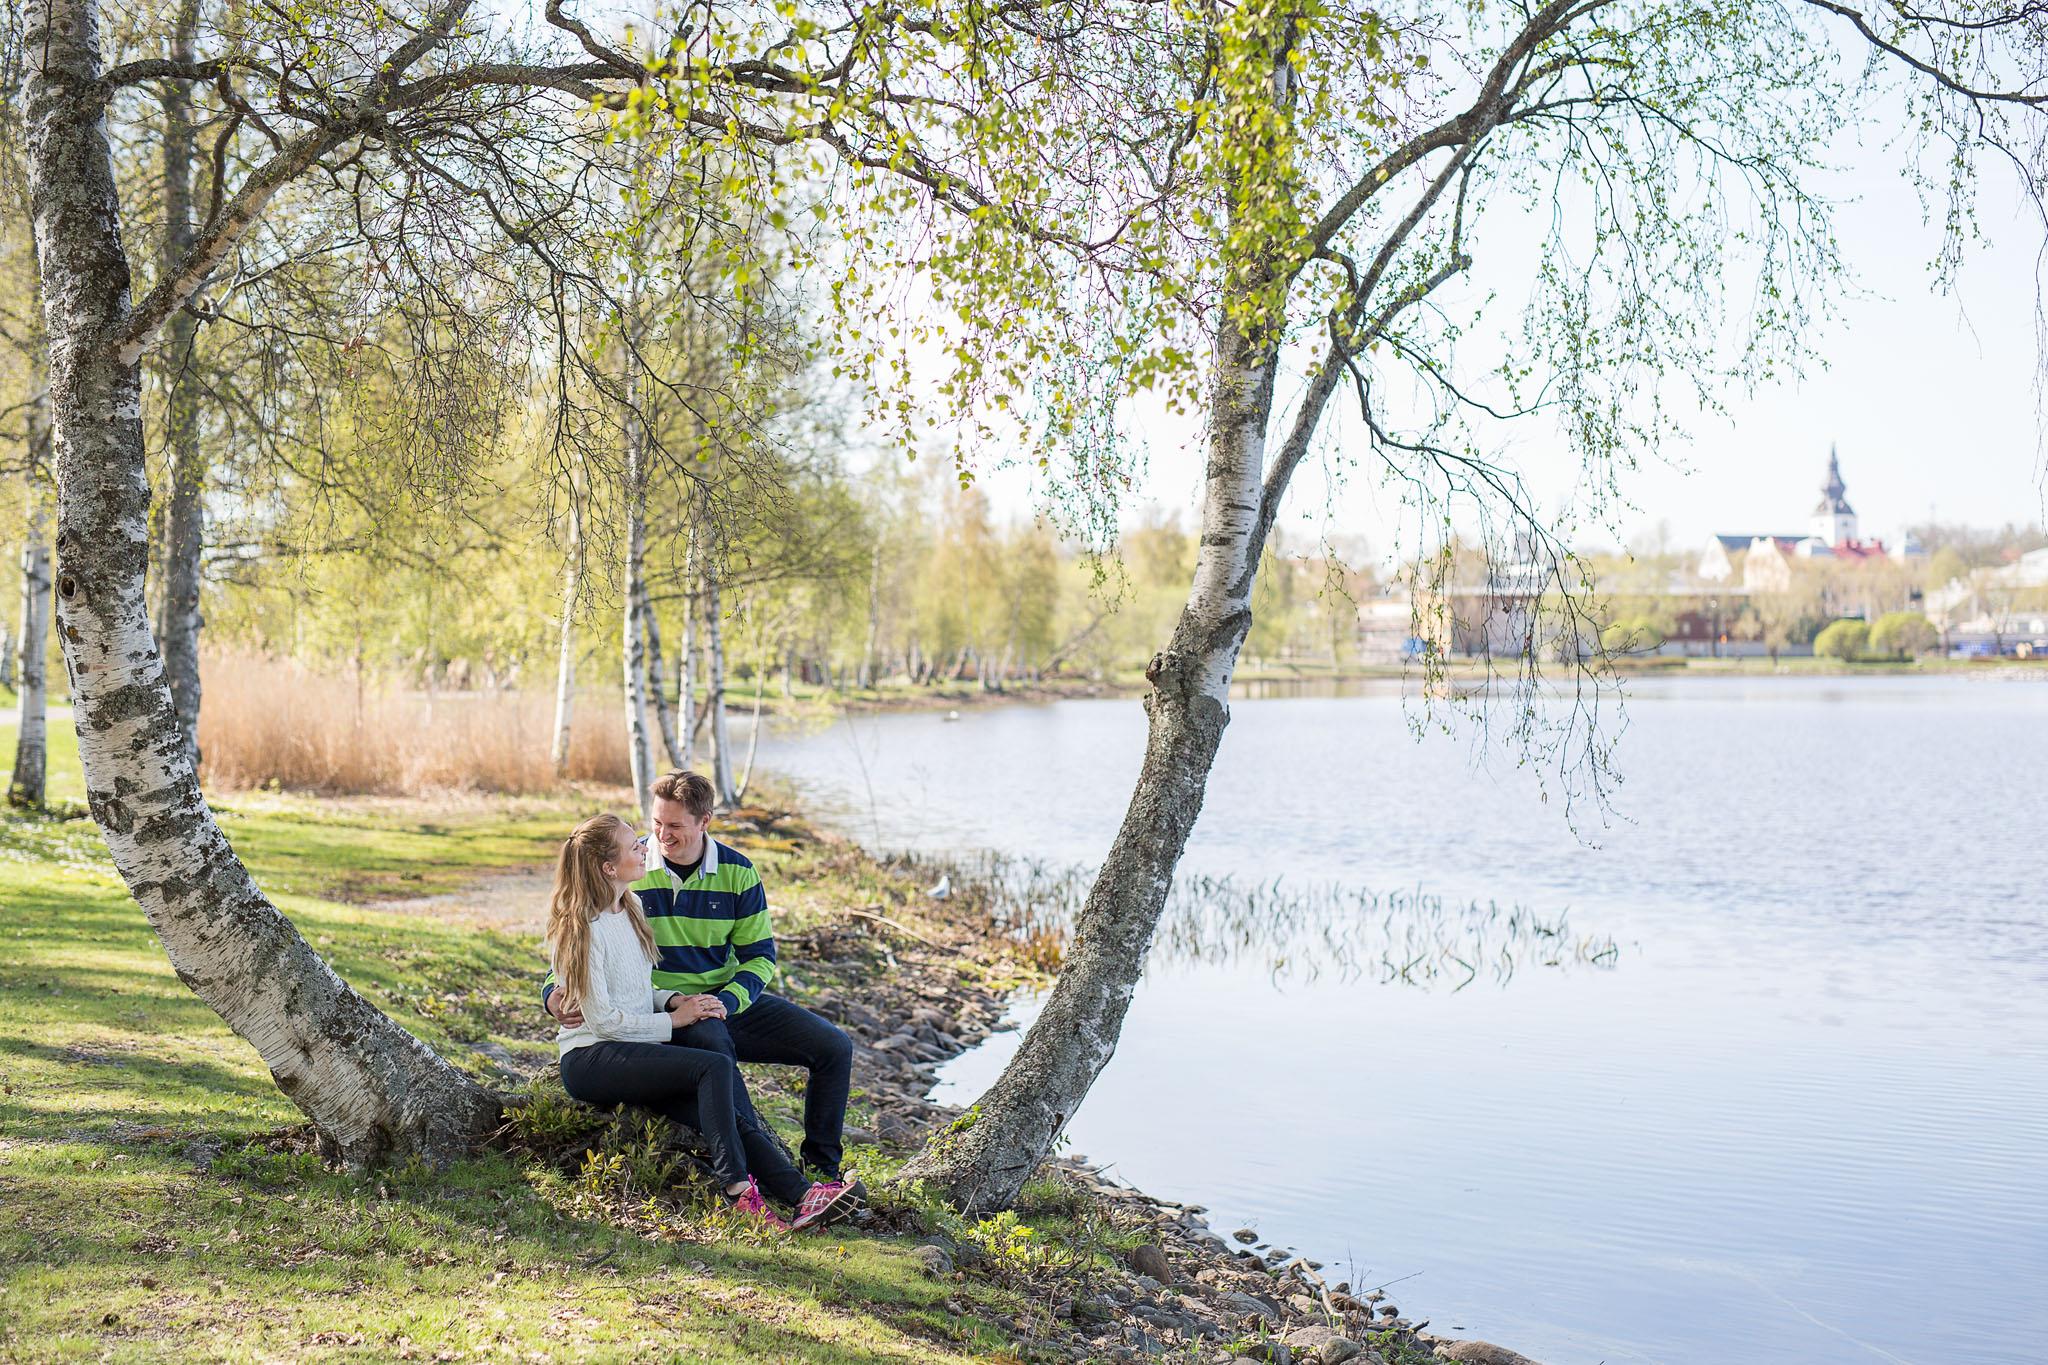 fotograf_sabina_wixner_hudiksvall_5.jpg